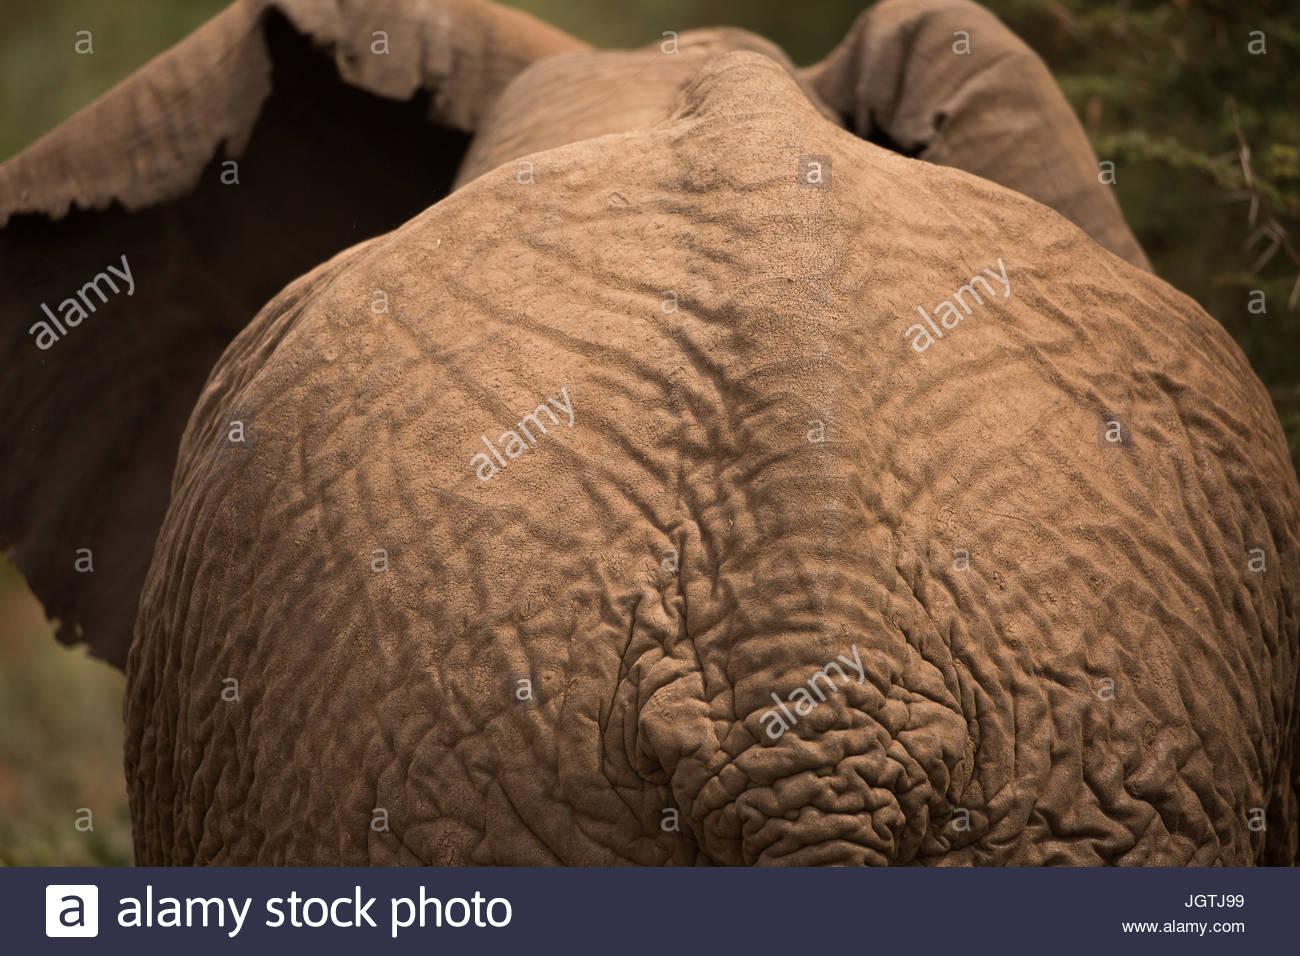 An African elephant in Lake Manyara National Park. - Stock Image